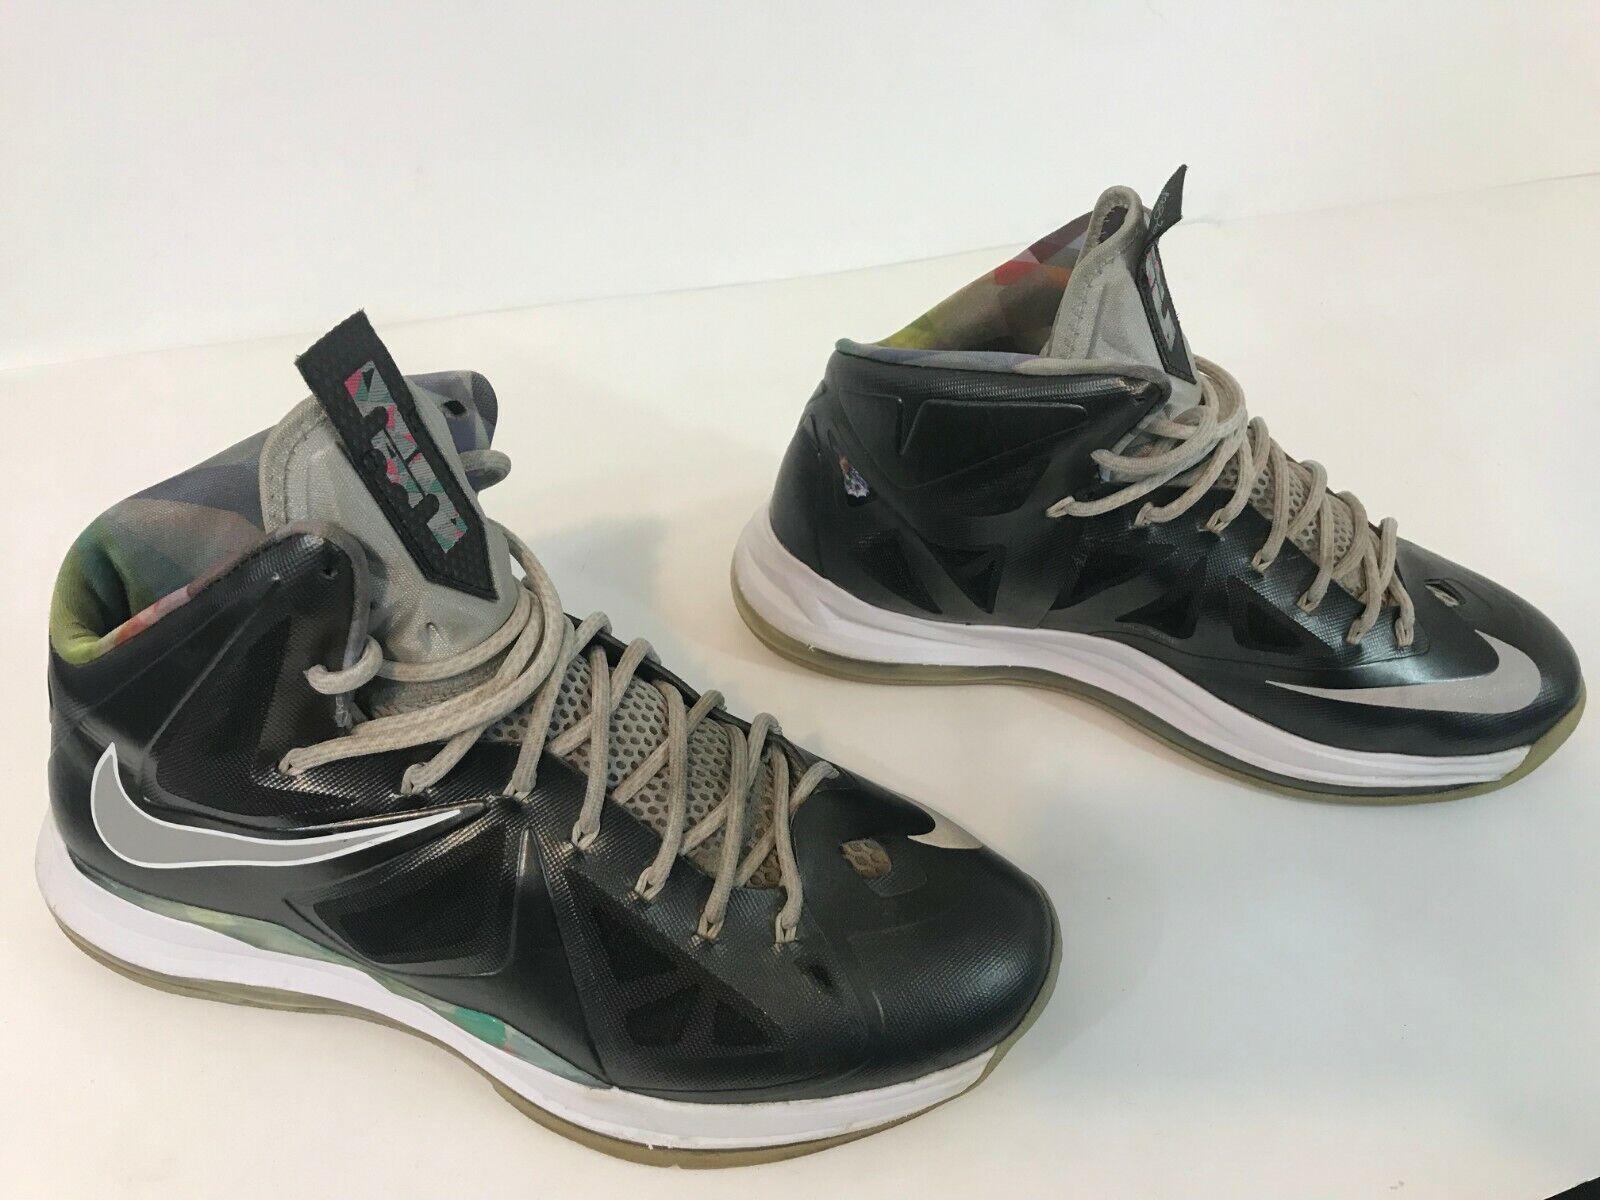 new arrivals 84cd3 923de Nike LEBRON X 10 Prism Mens shoes Size Size Size 11 Black Strata Grey White  541100